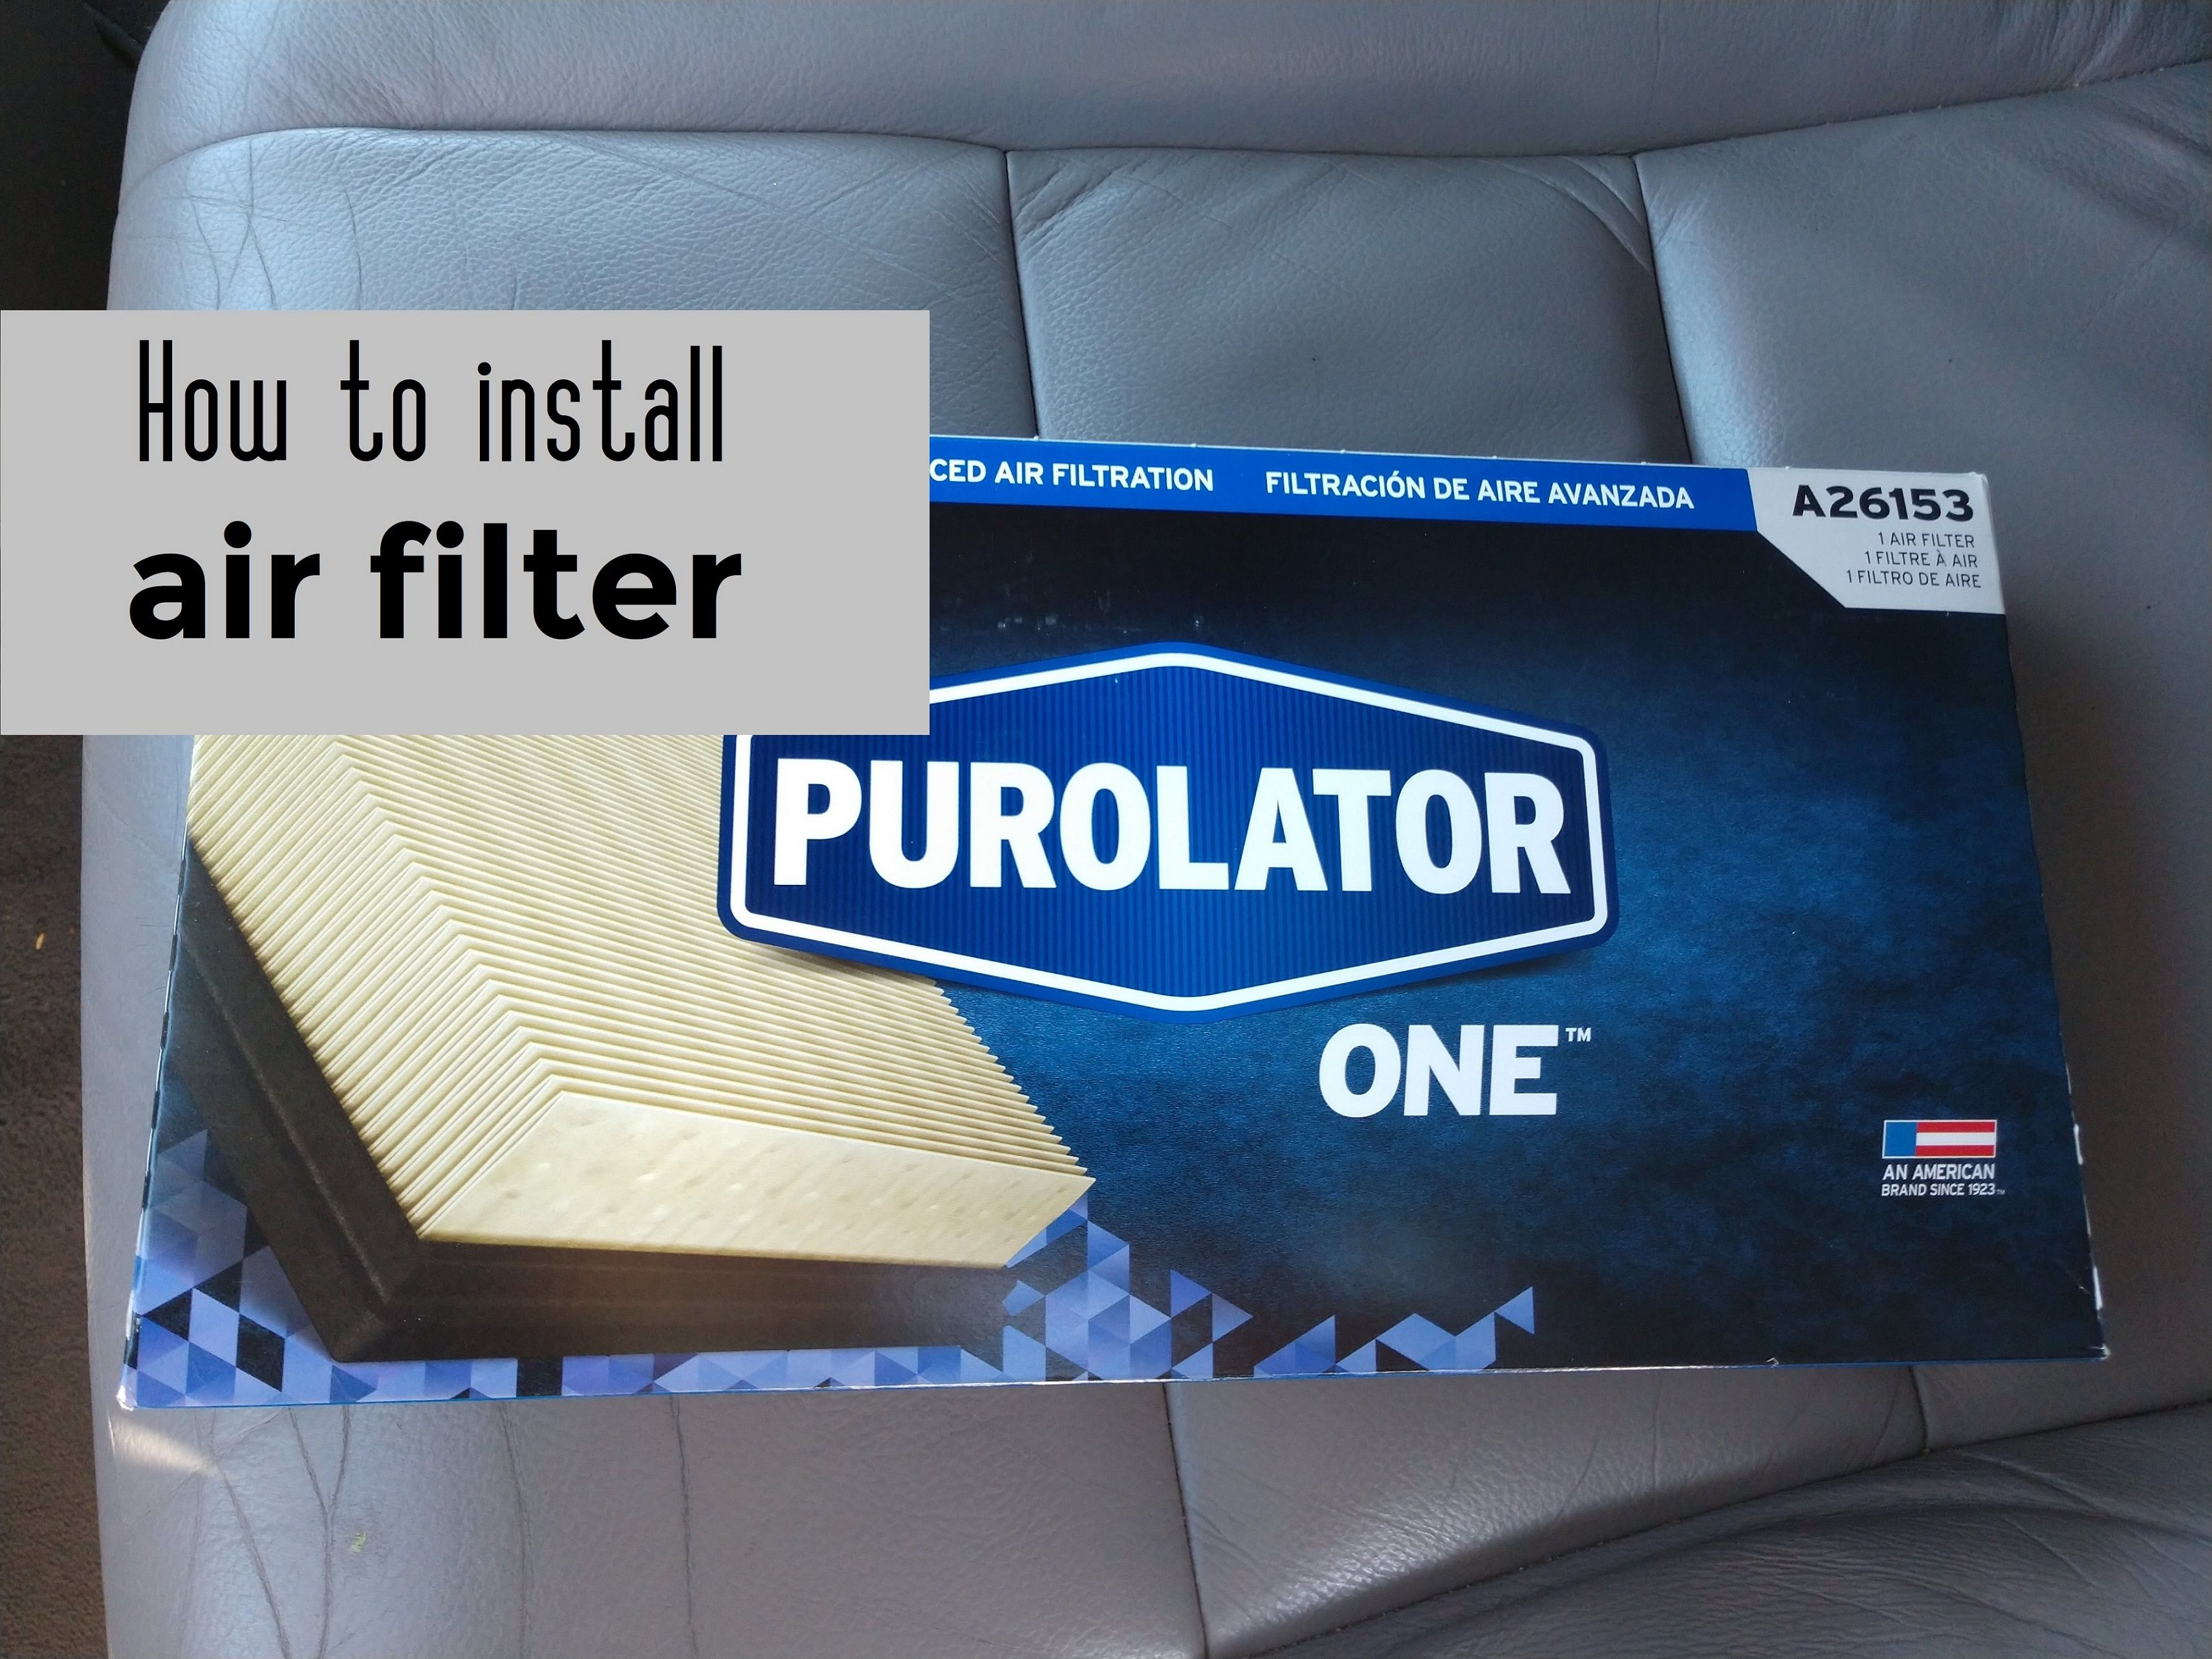 Purolator A26153 PurolatorONE Air Filter